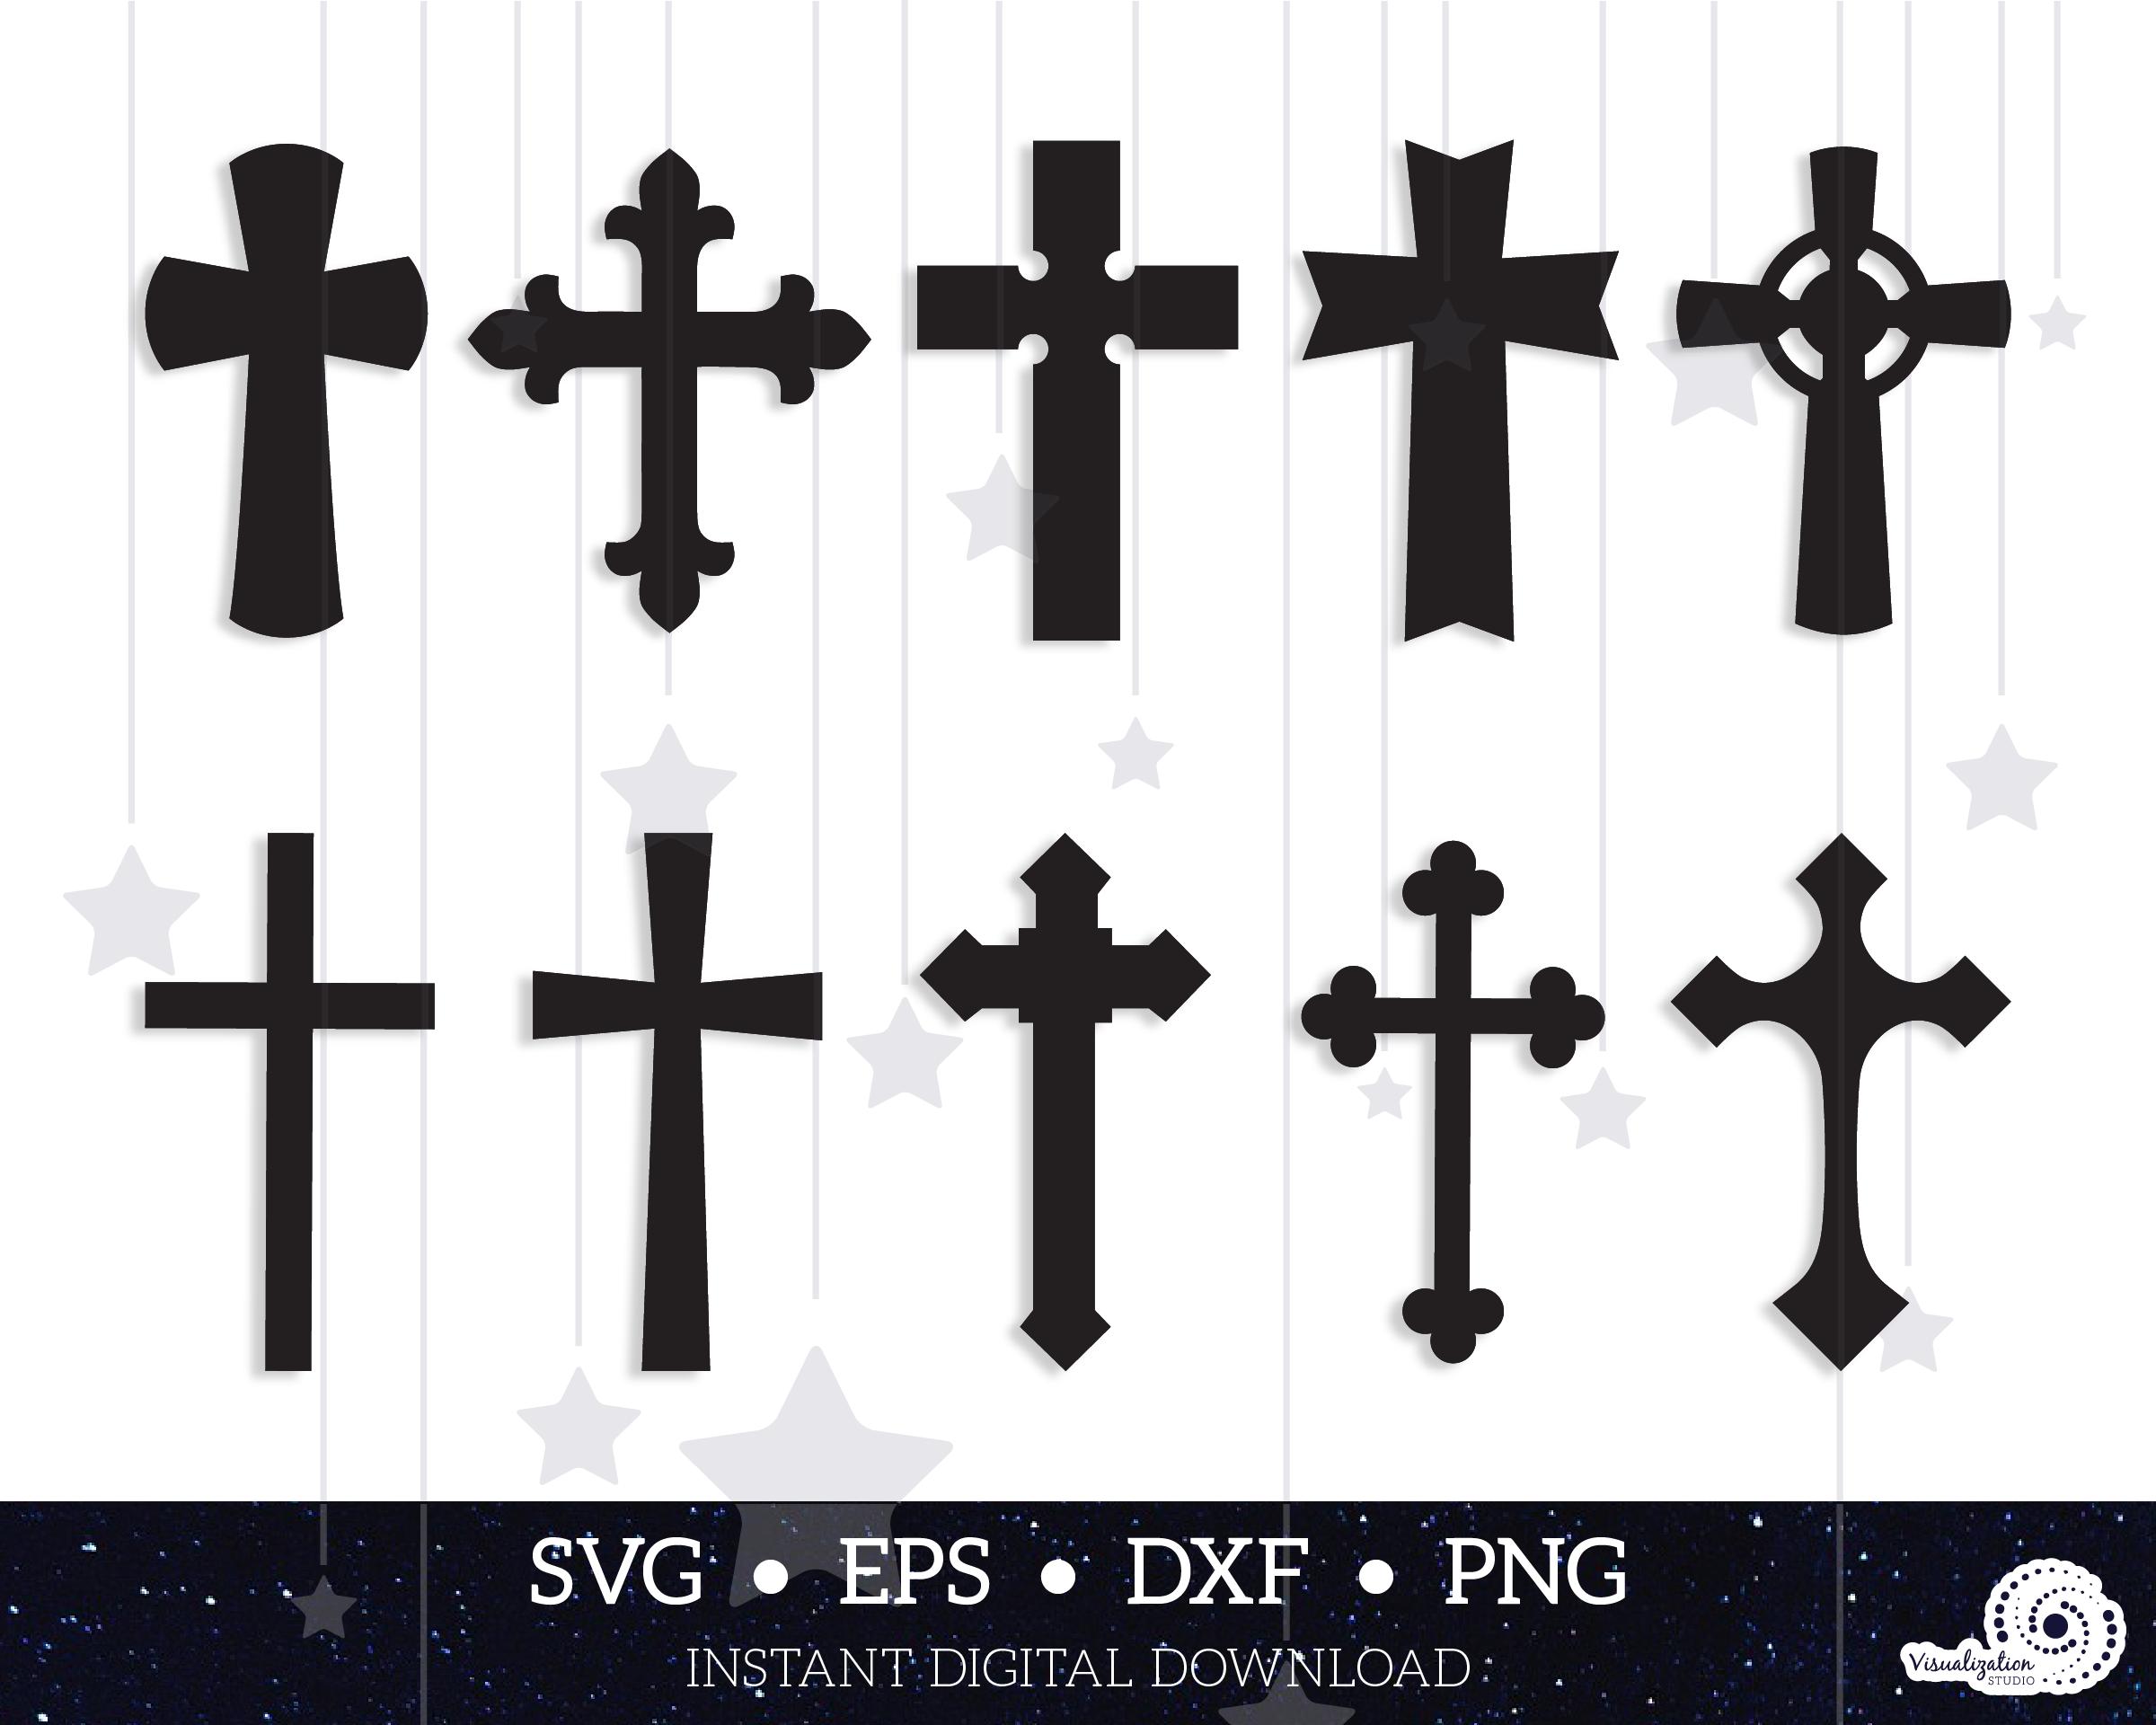 Crosses Vector Set Instant Digital Download Svg Dxf Etsy In 2020 Cross Vector Vector Dxf